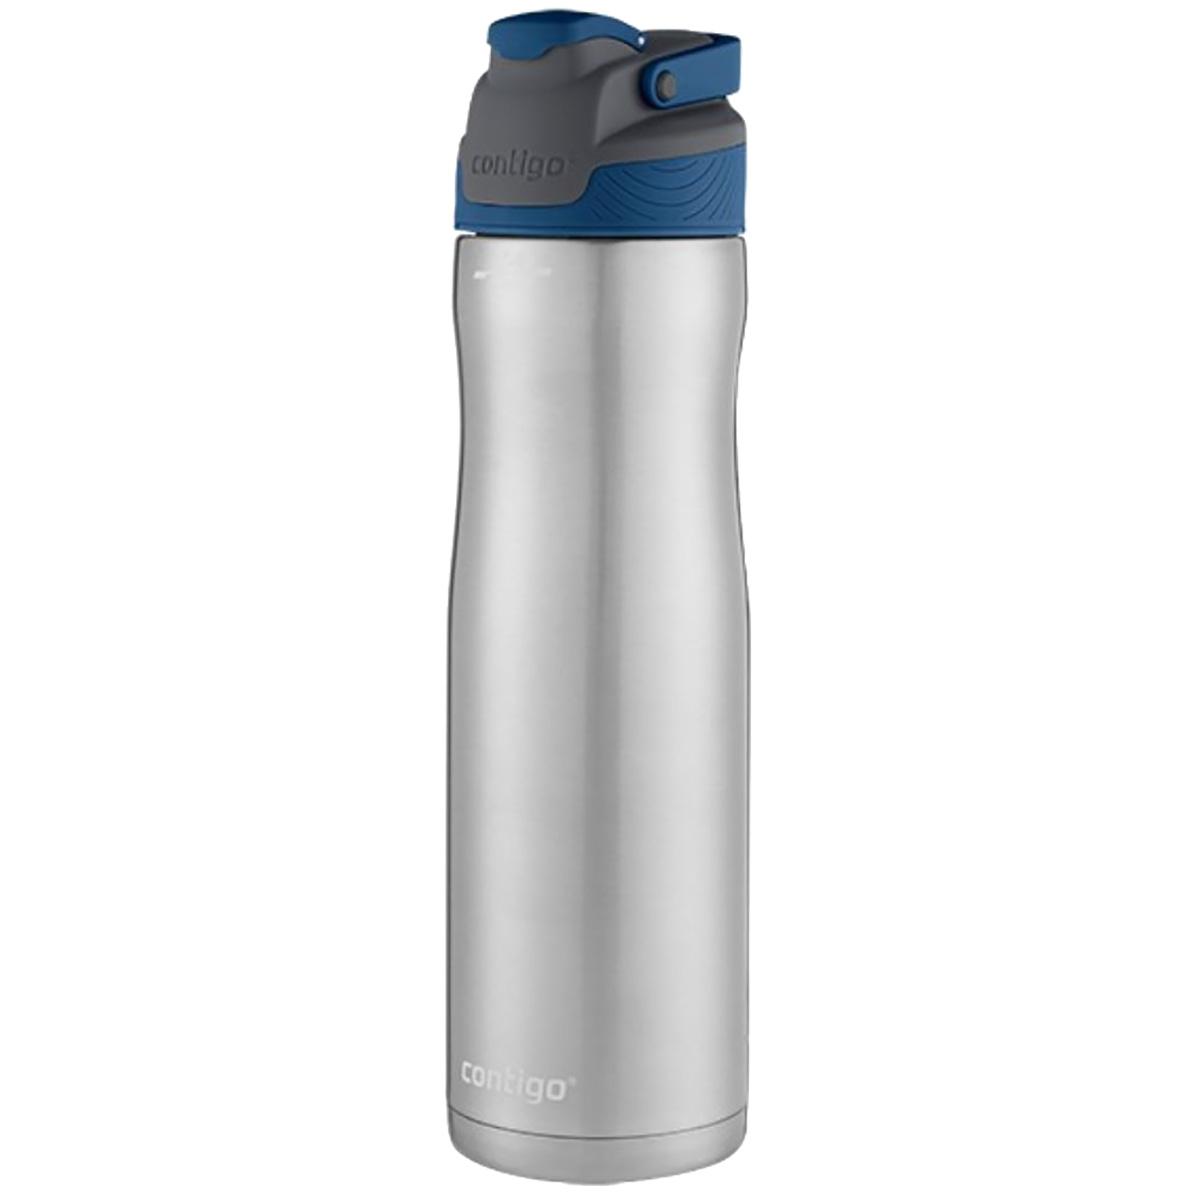 Contigo-24-oz-Chill-Autoseal-Stainless-Steel-Water-Bottle thumbnail 17